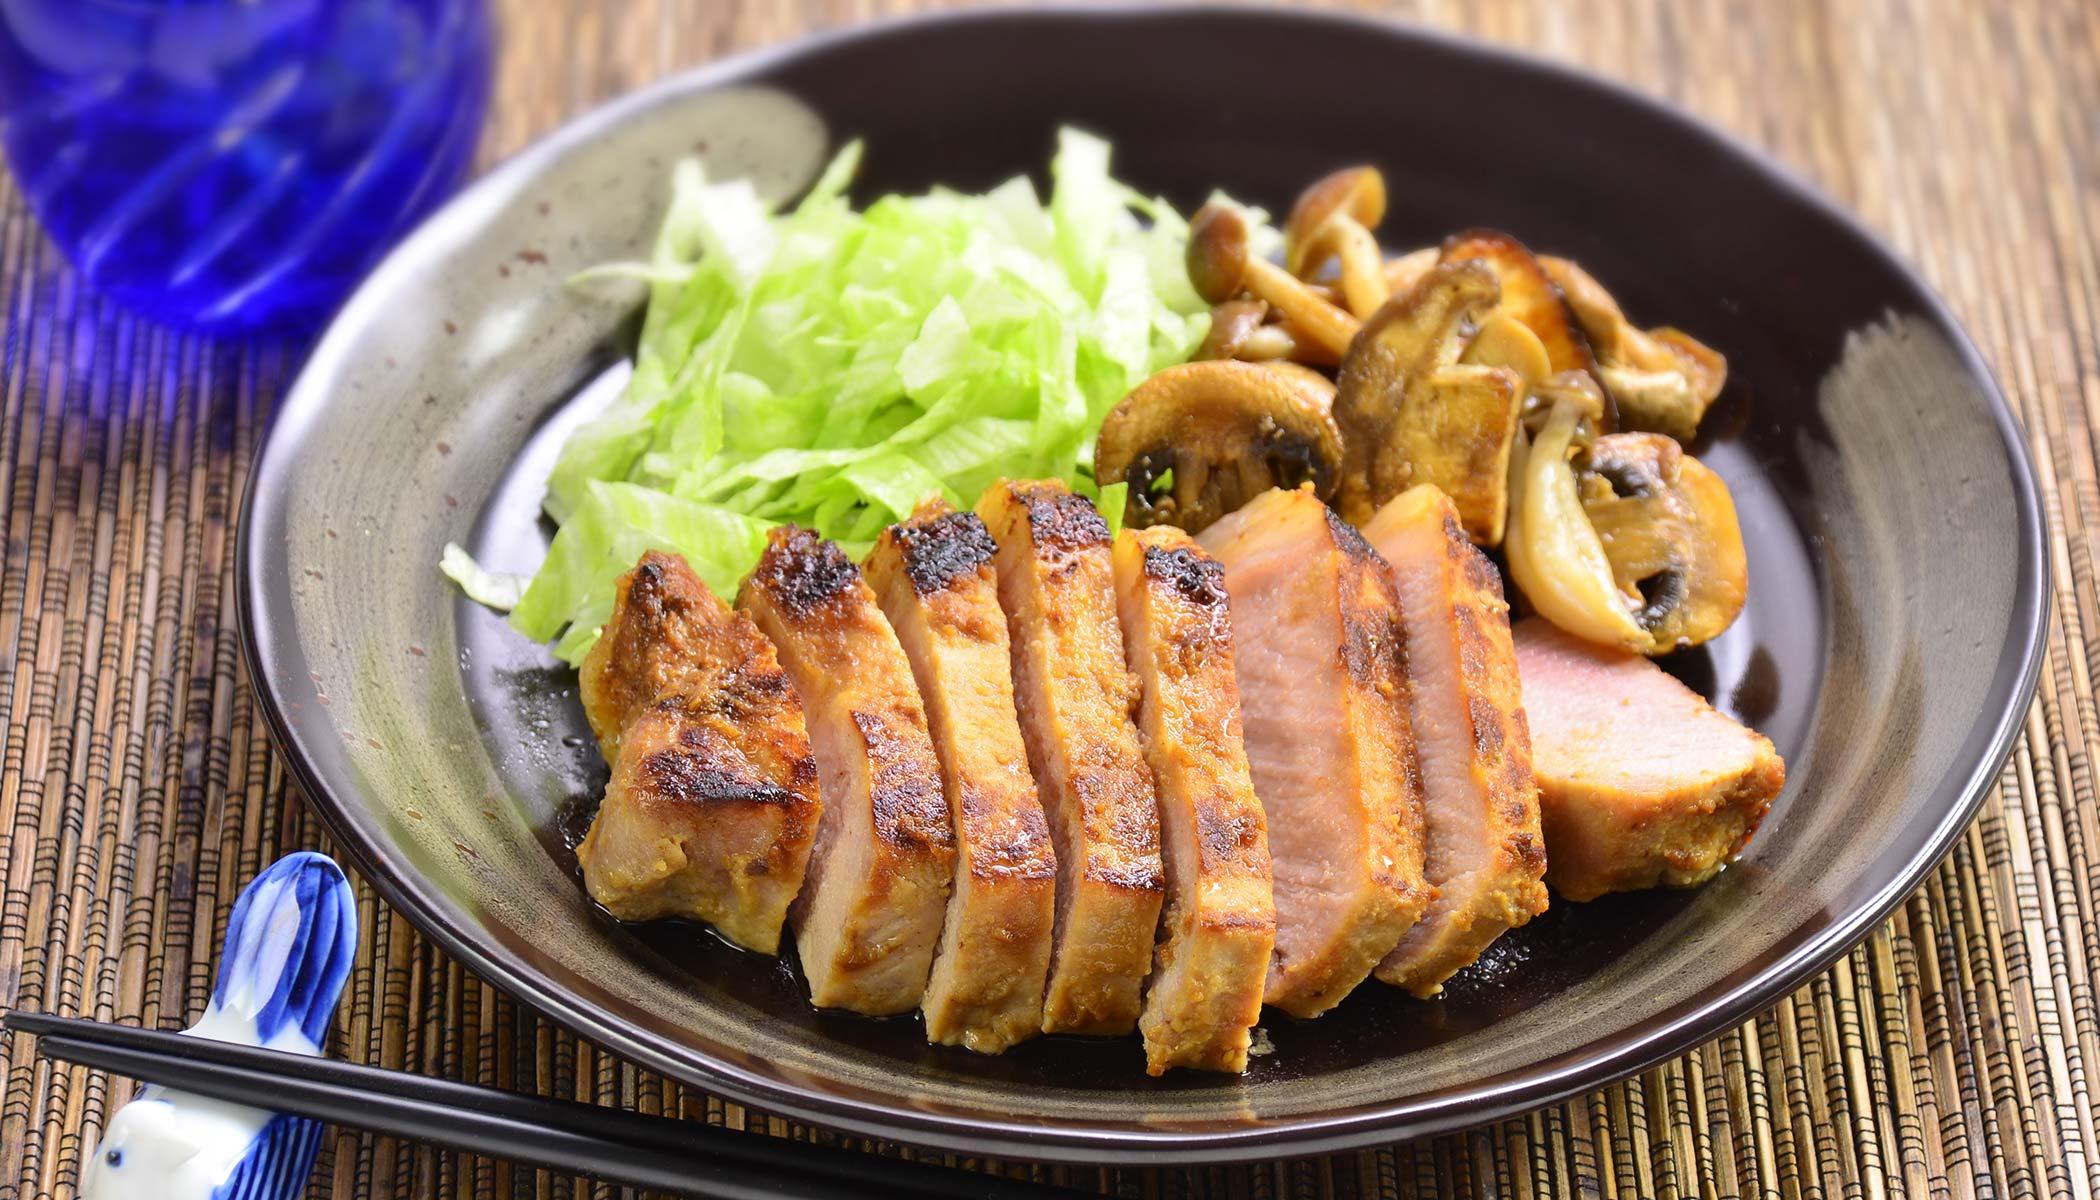 <i>Miso</i> Garlic Pork & Mushroom Stir-Fry